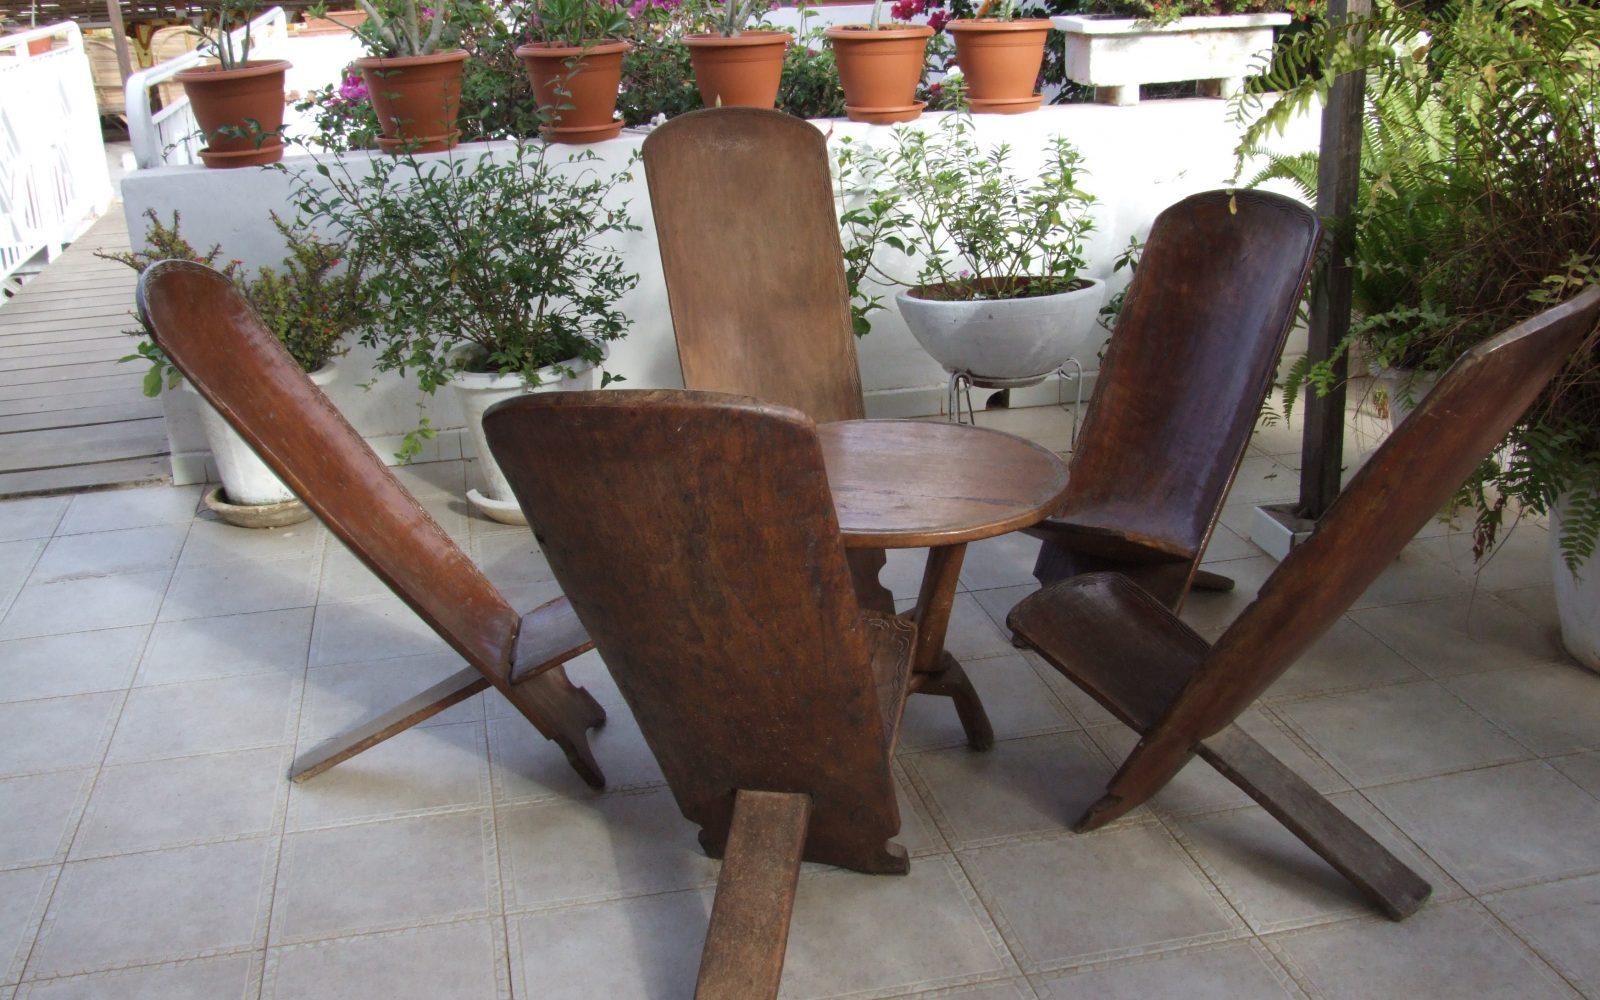 Galer a de im genes sillas para terrazas for Mesas de terraza plegables